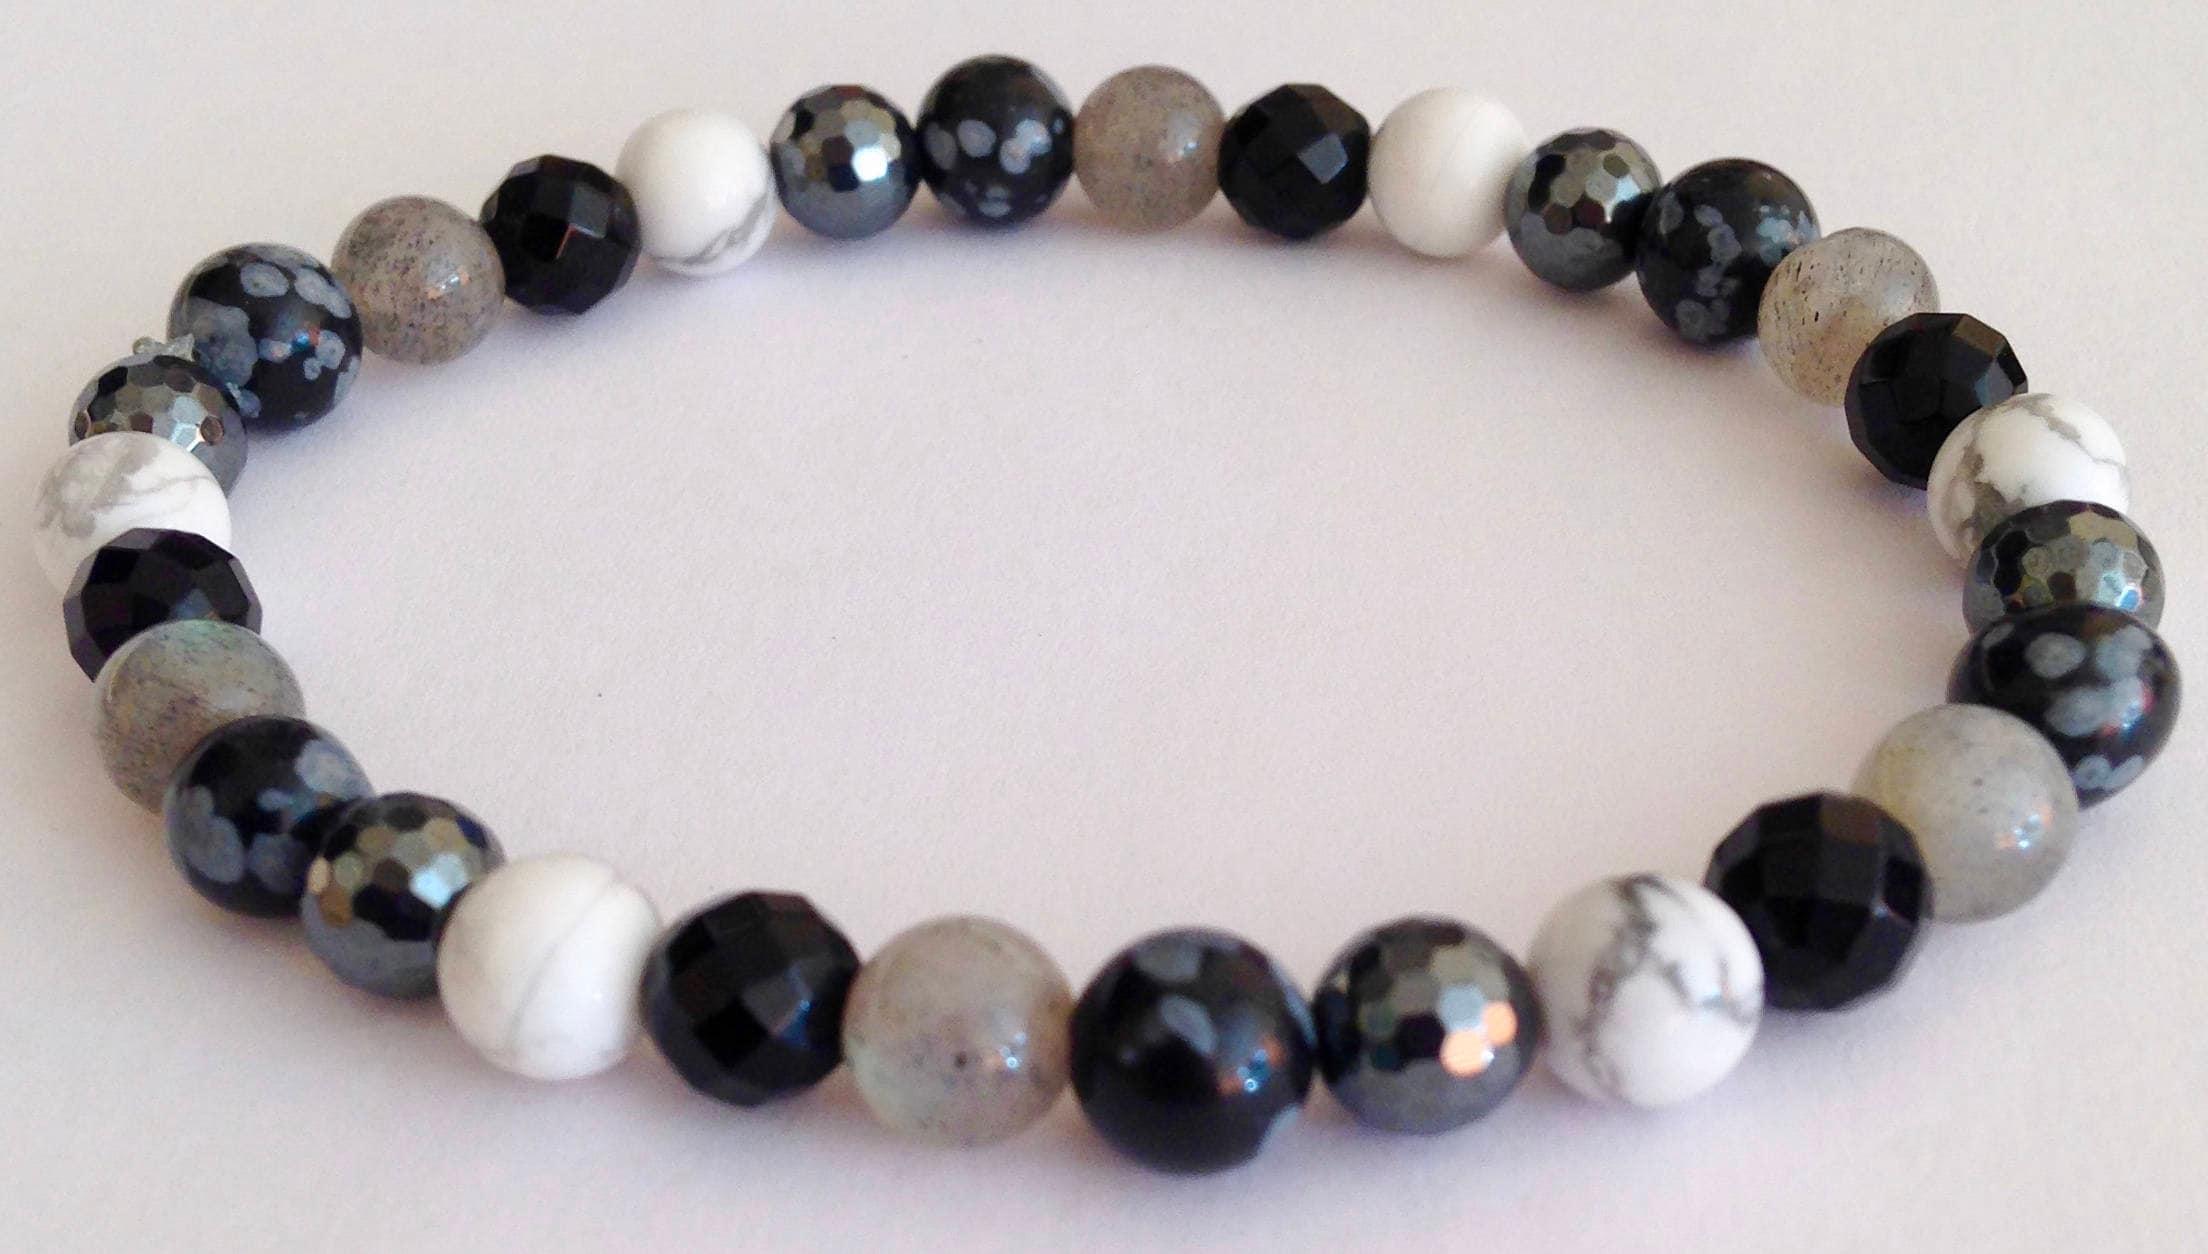 Gemstone stretch bracelet  black  white  grey  Hematite  Howlite  Onyx  Labradorite  Snowflake Obsidian  crystals  natural